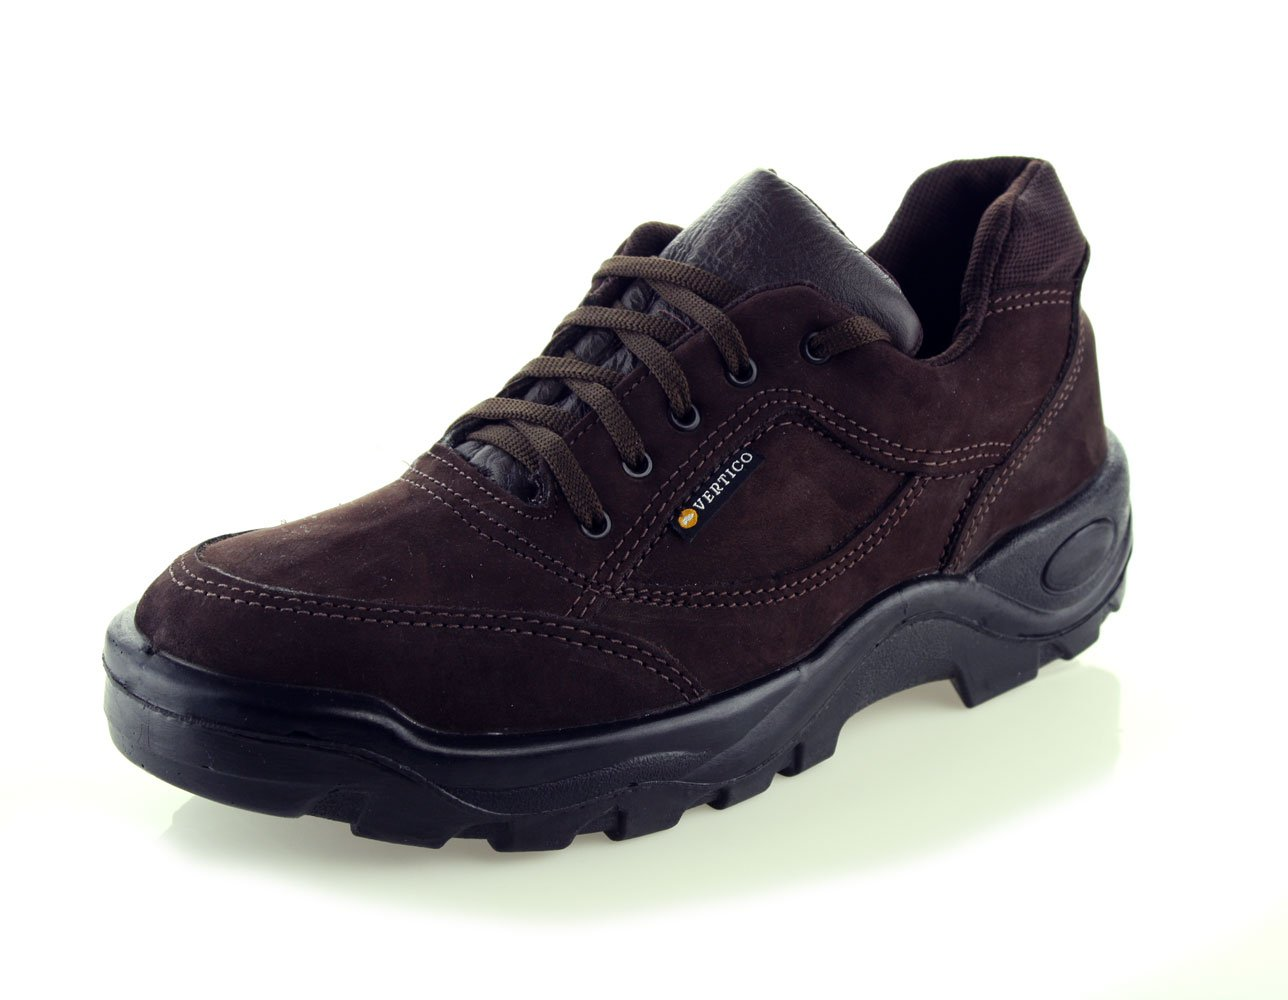 Vertico Ascender LT Shoes Brown Leather EU 45